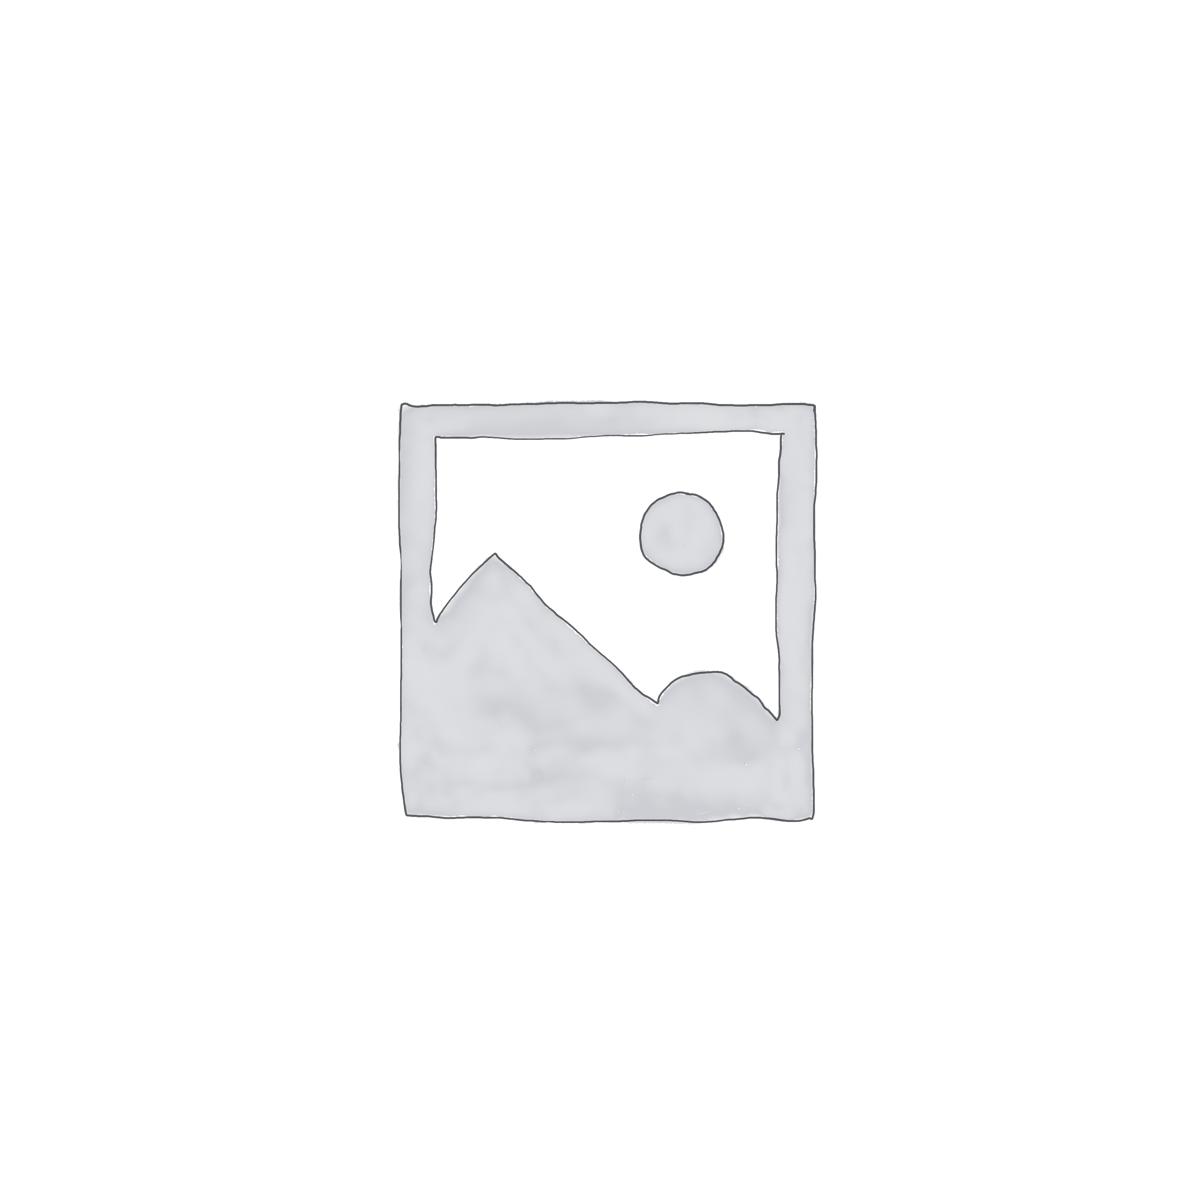 Misty Pine Forest Wallpaper Mural